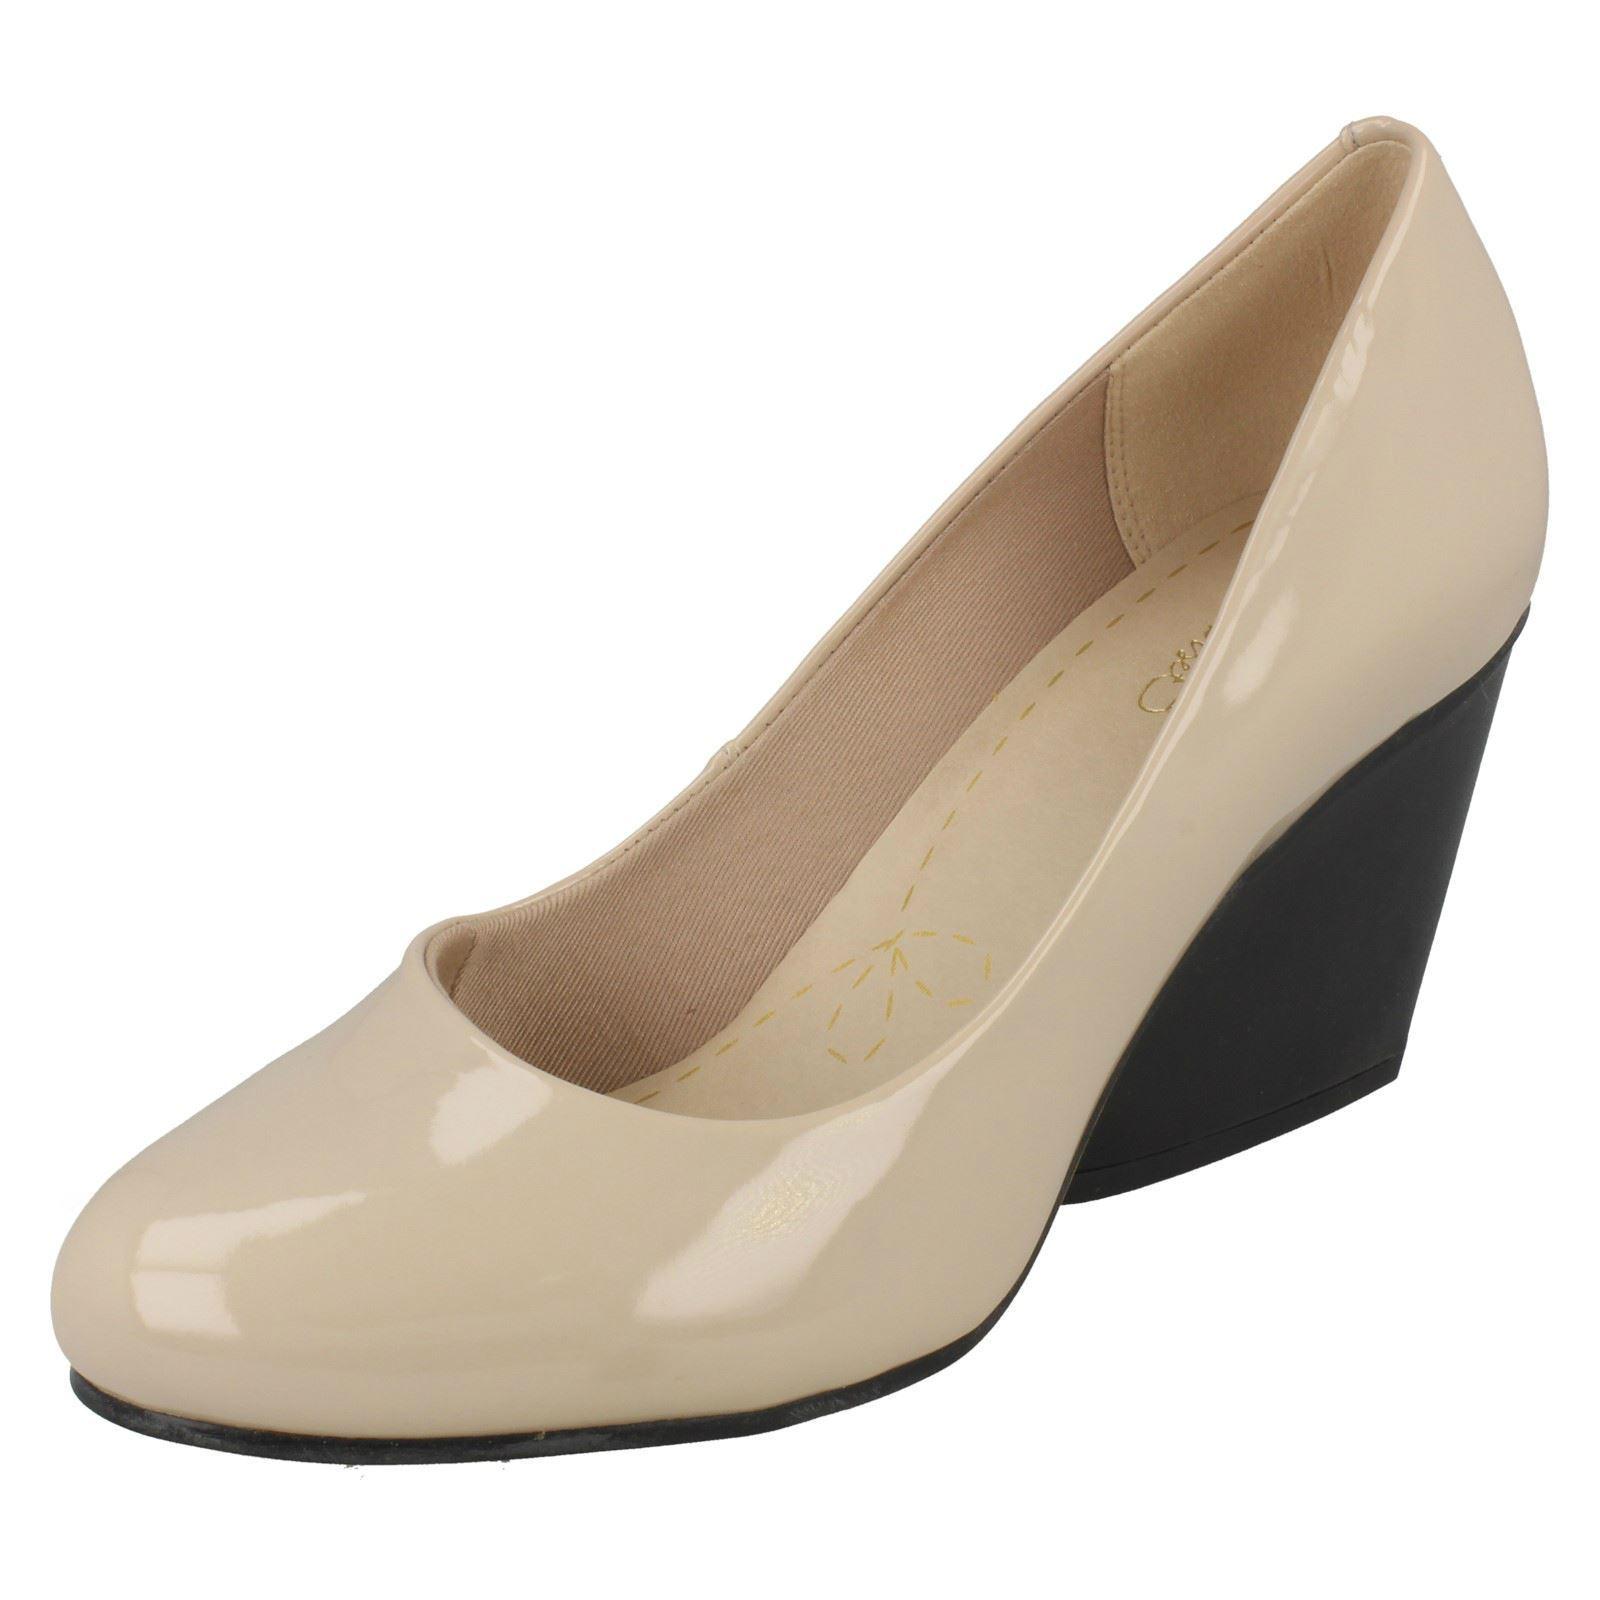 Clarks Femmes Smart Talon Compensé Chaussures Demerara Spice